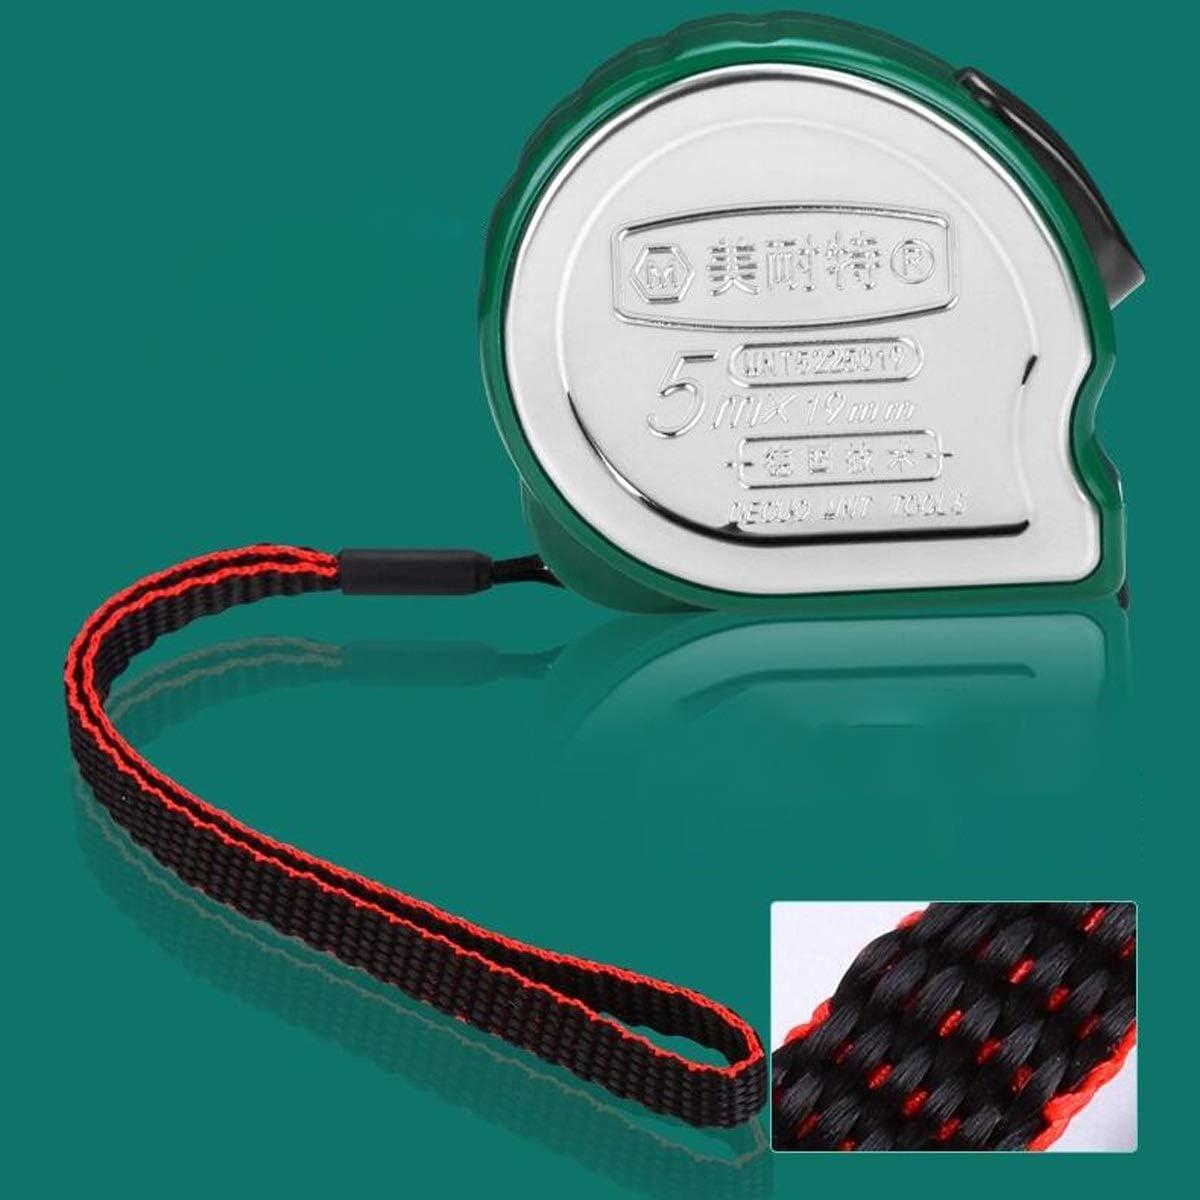 YINJIESHANGMAO Ruler Color : Silver, Size : 5m Steel Tape Measure Box Ruler Ruler Woodworking Measuring Tool 3//5//7.5m